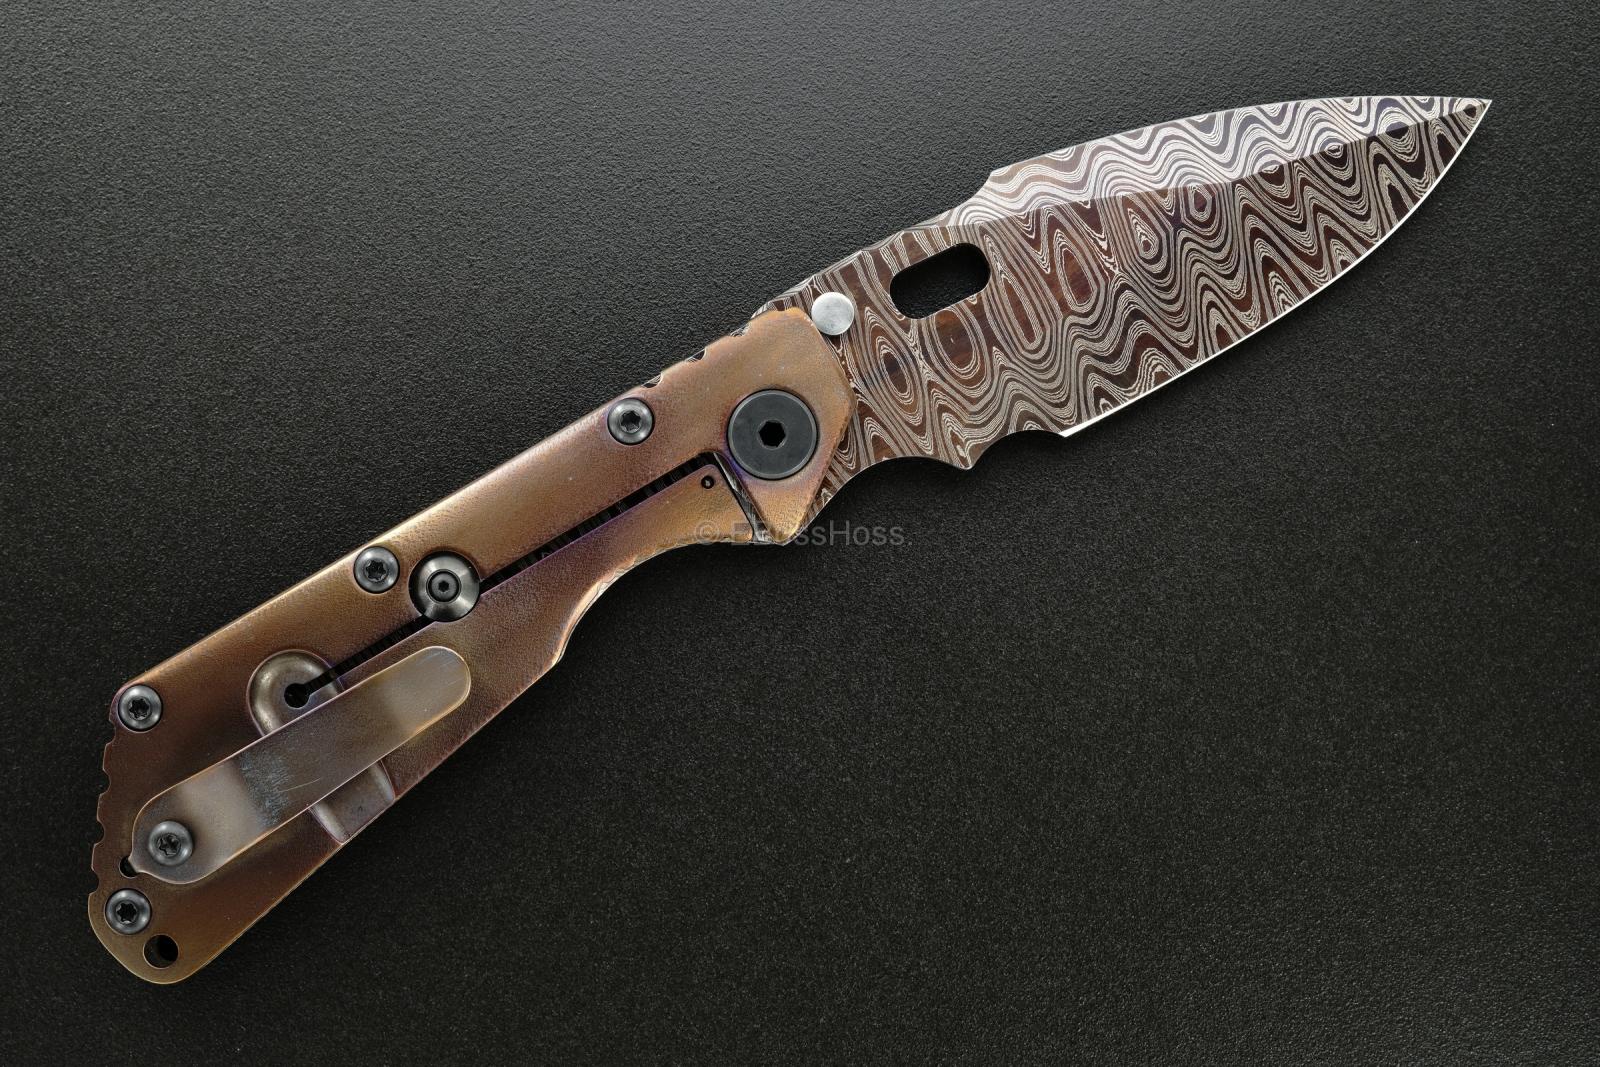 Mick Strider Custom (MSC) Deluxe Sharkfin SMF